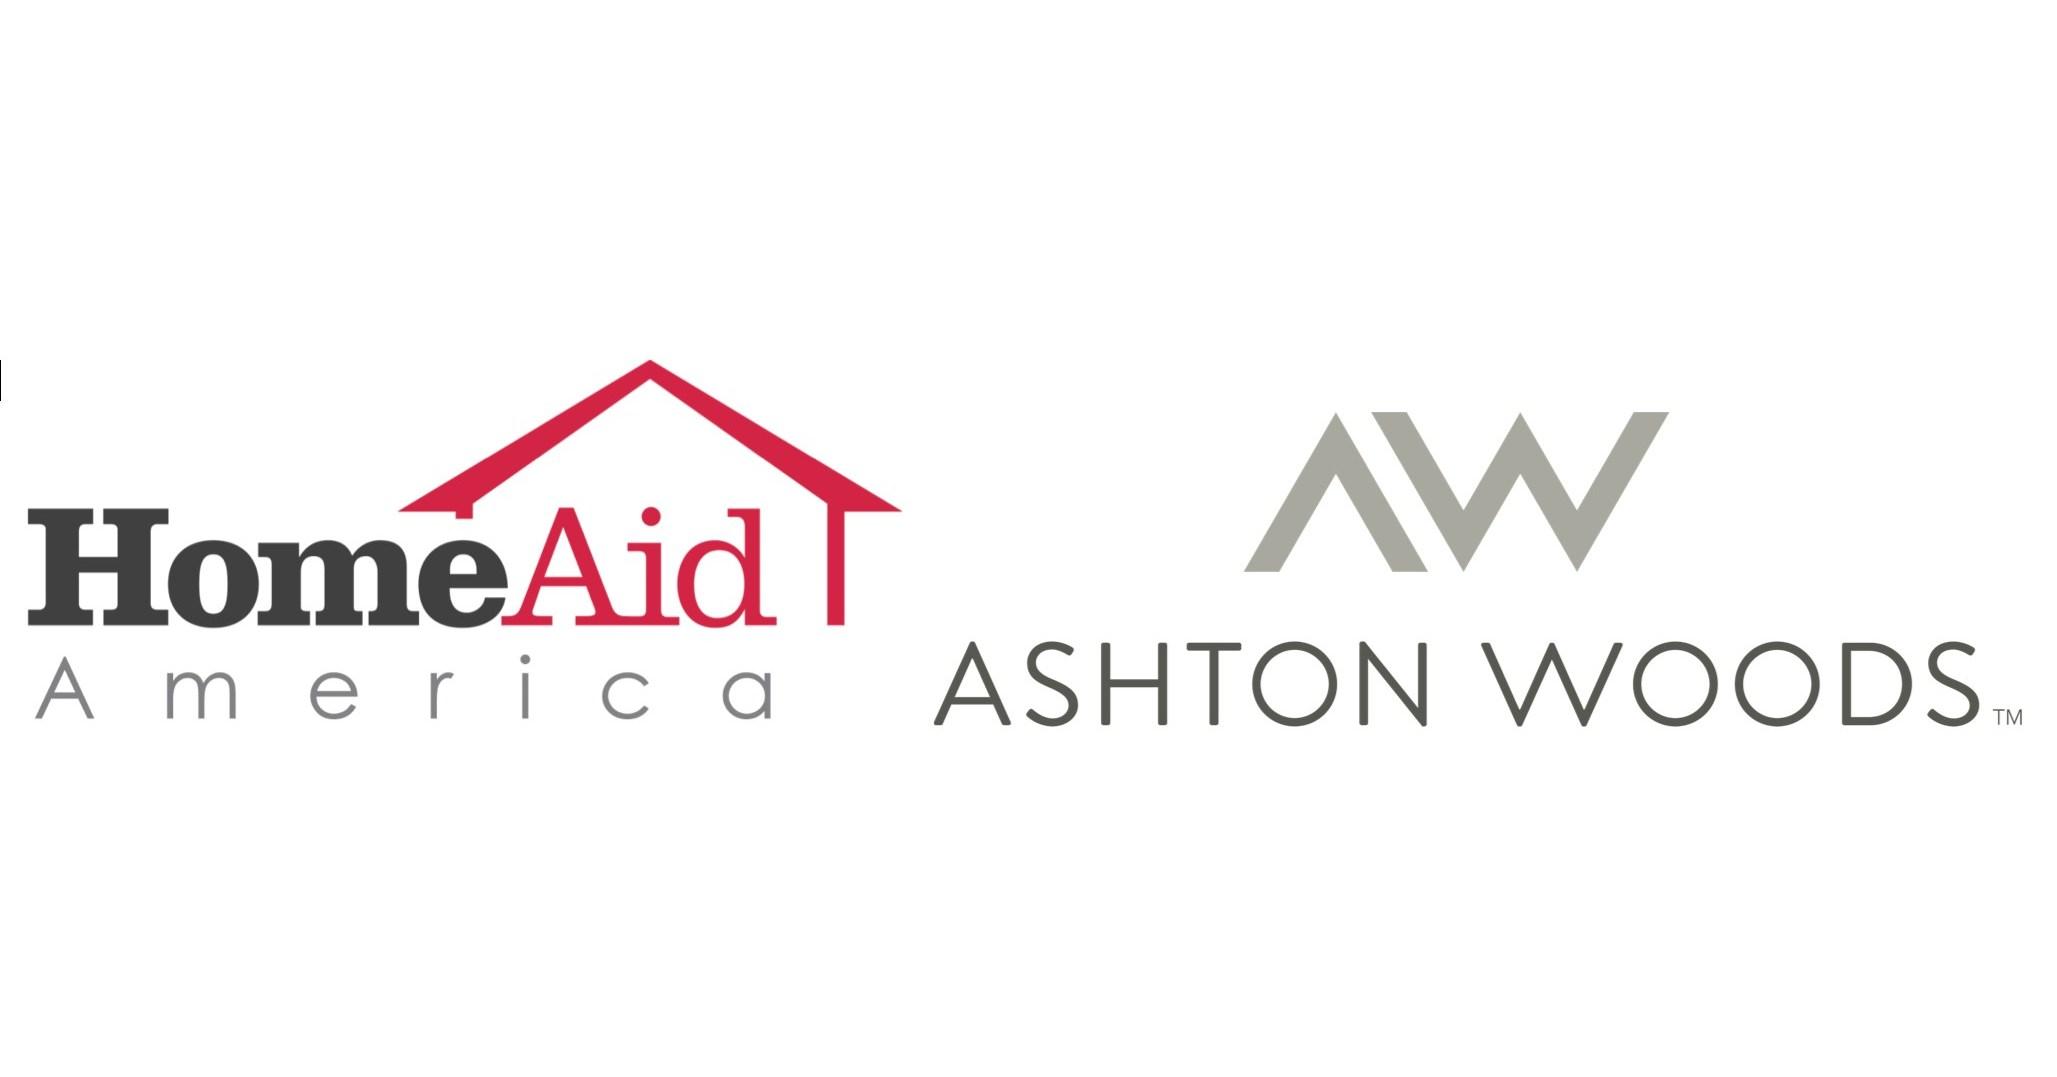 Ken Balogh of Ashton Woods Joins HomeAid\'s Fight on Homelessness